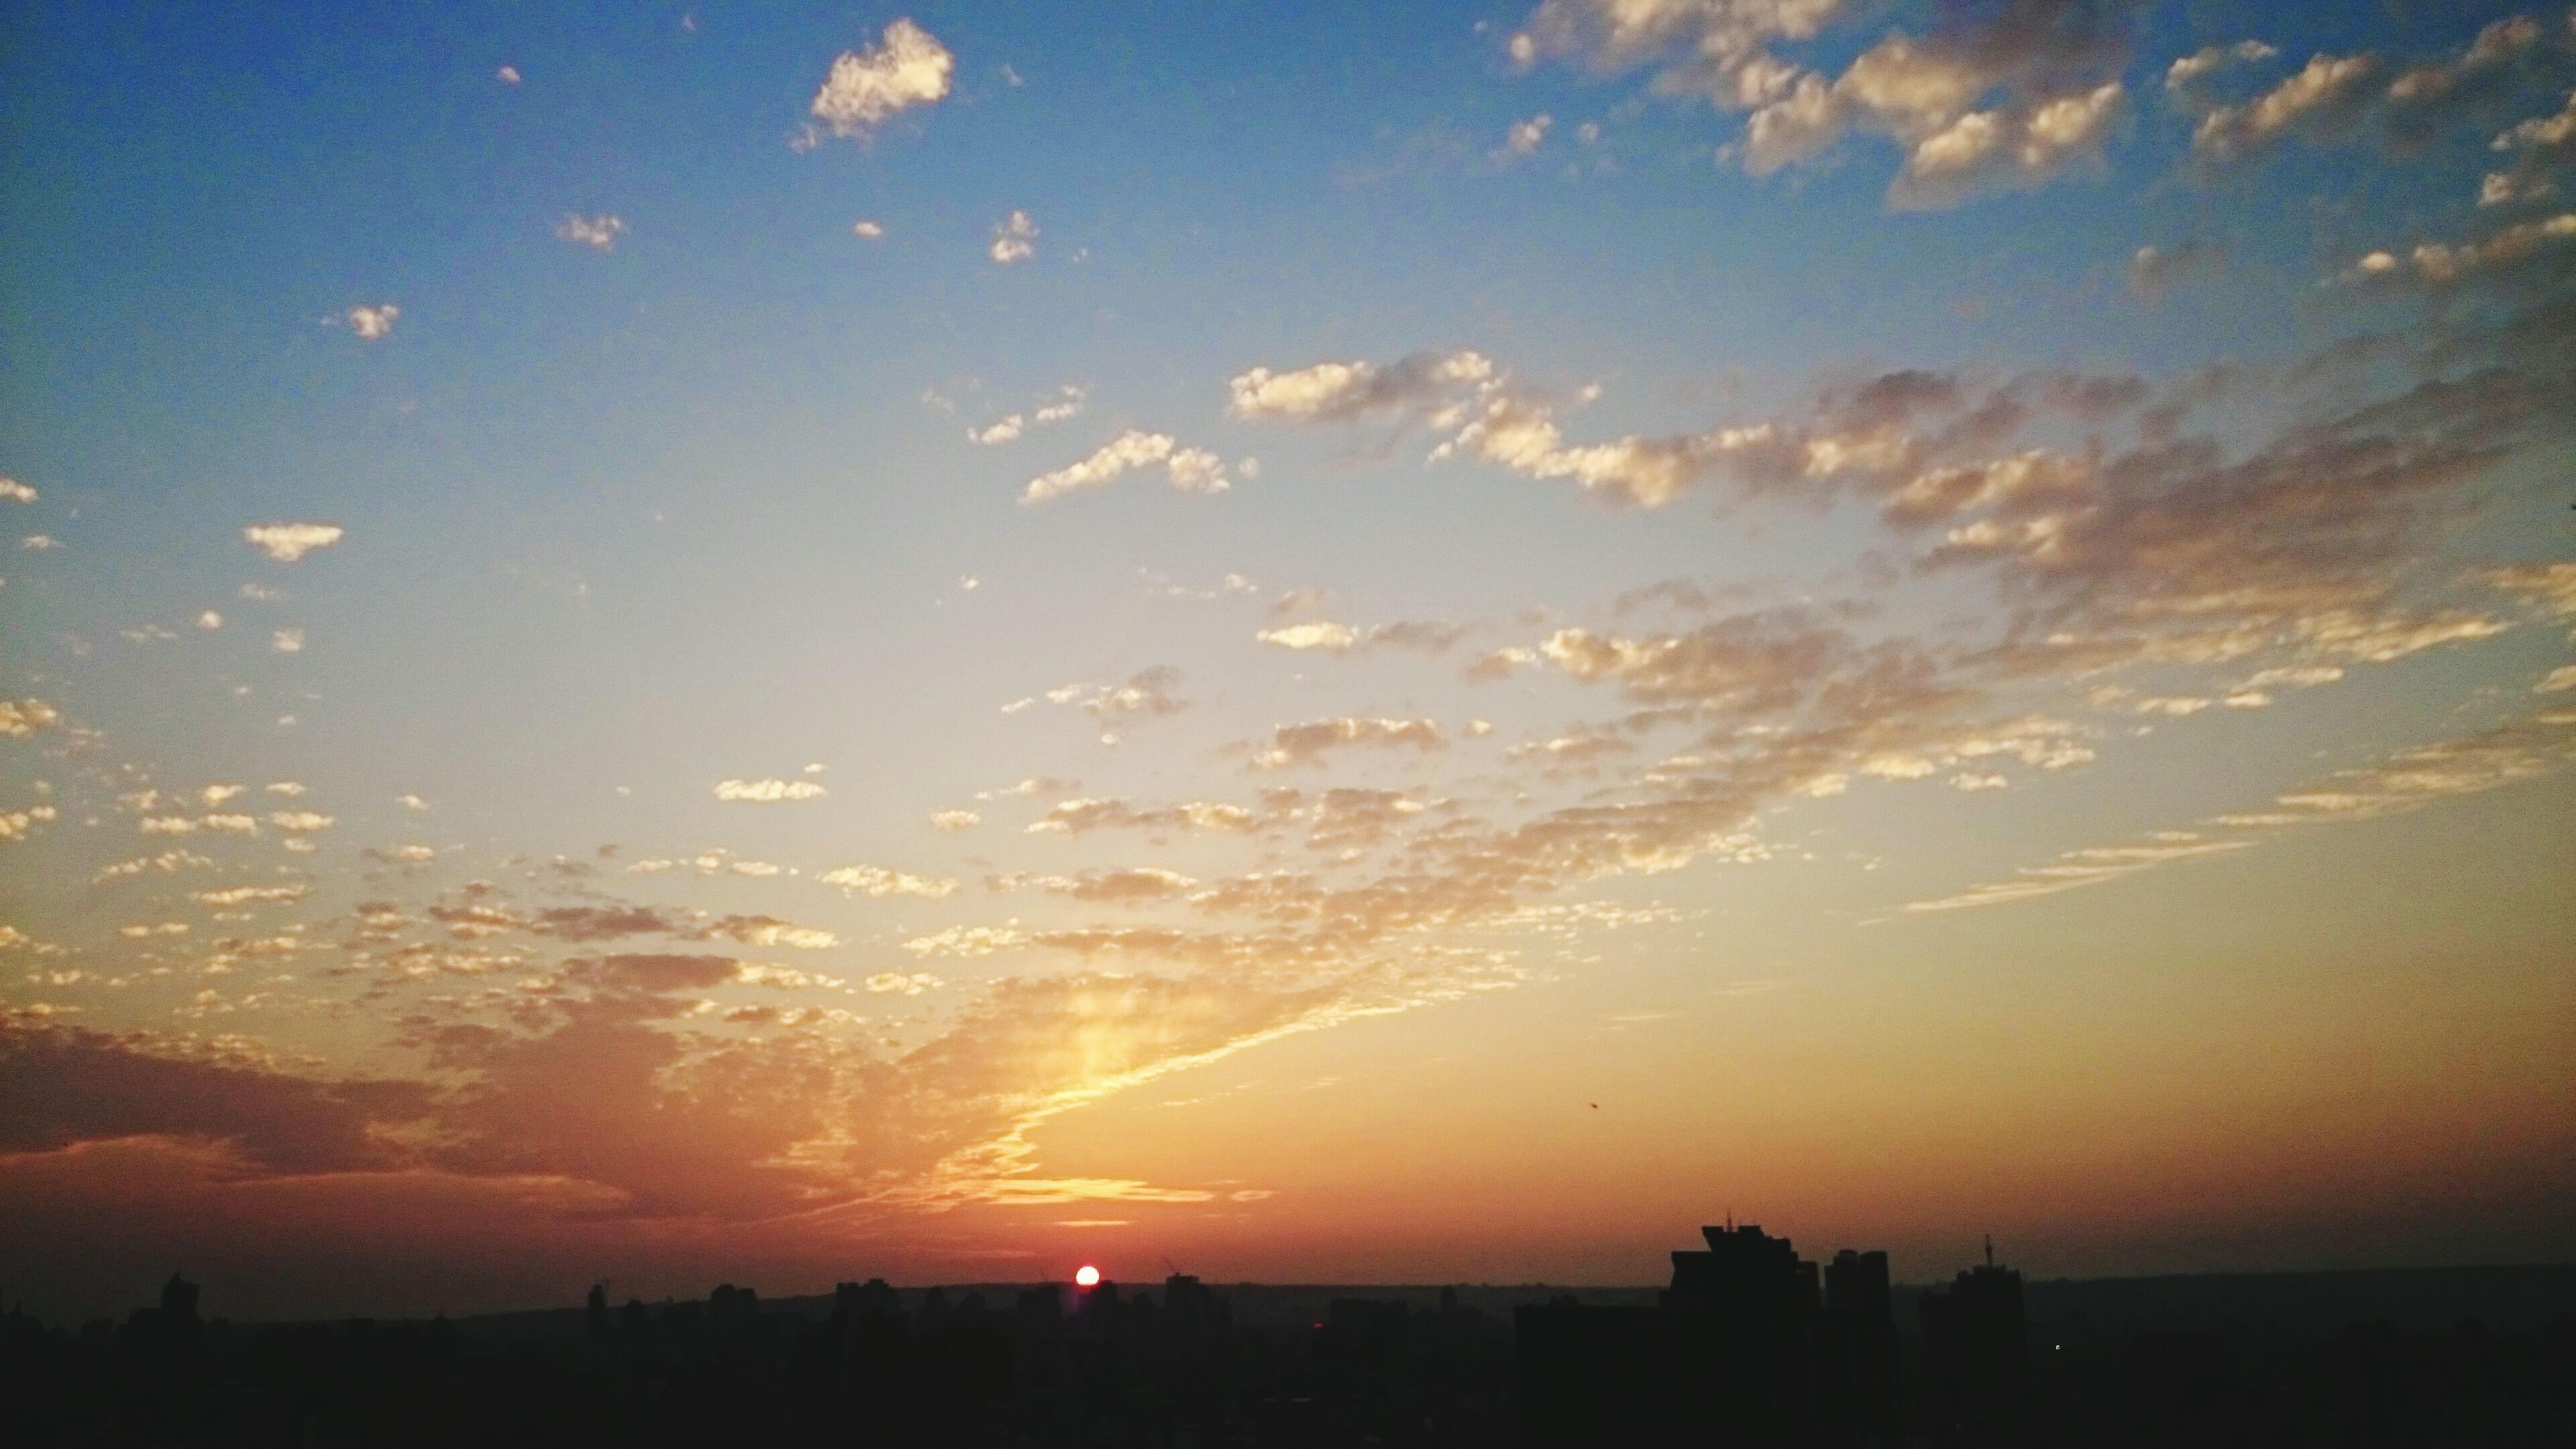 sunset, silhouette, scenics, sky, cityscape, beauty in nature, city, building exterior, tranquil scene, landscape, nature, orange color, tranquility, cloud - sky, idyllic, built structure, sun, architecture, outdoors, no people